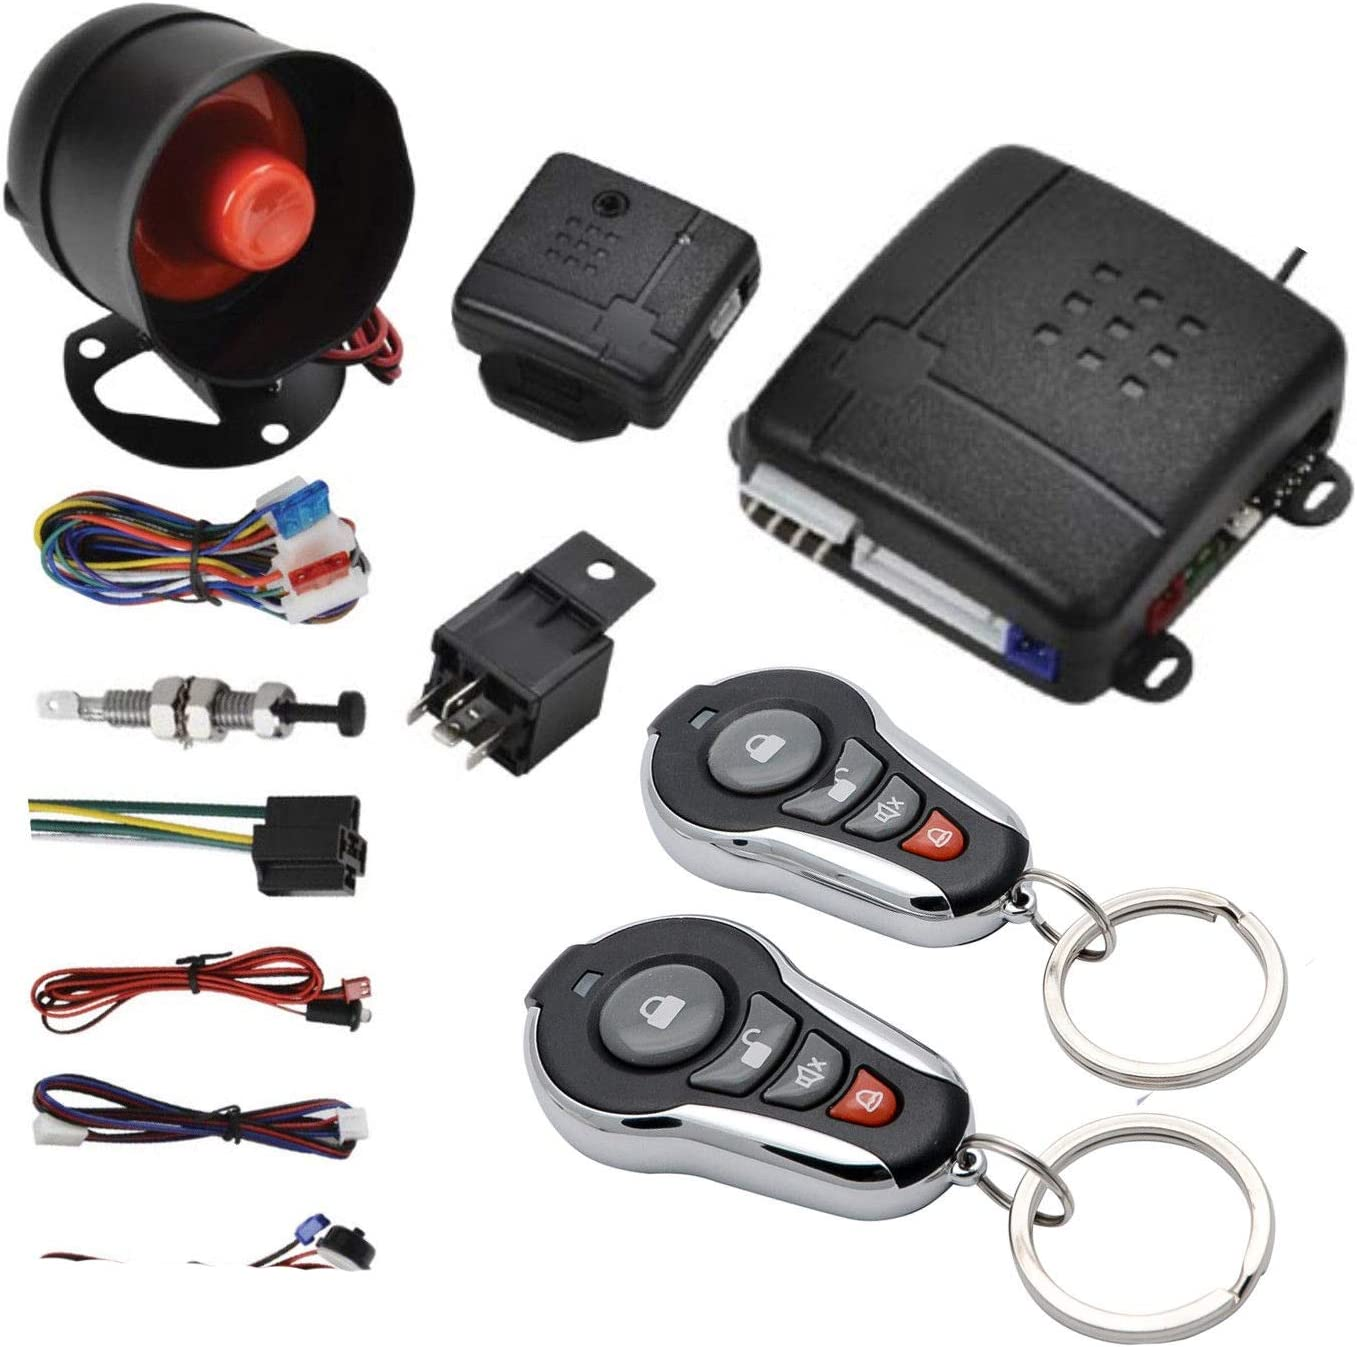 MASO Car Central Lock Universal Kit Remote Auto Vehicle Japan Maker New Arlington Mall